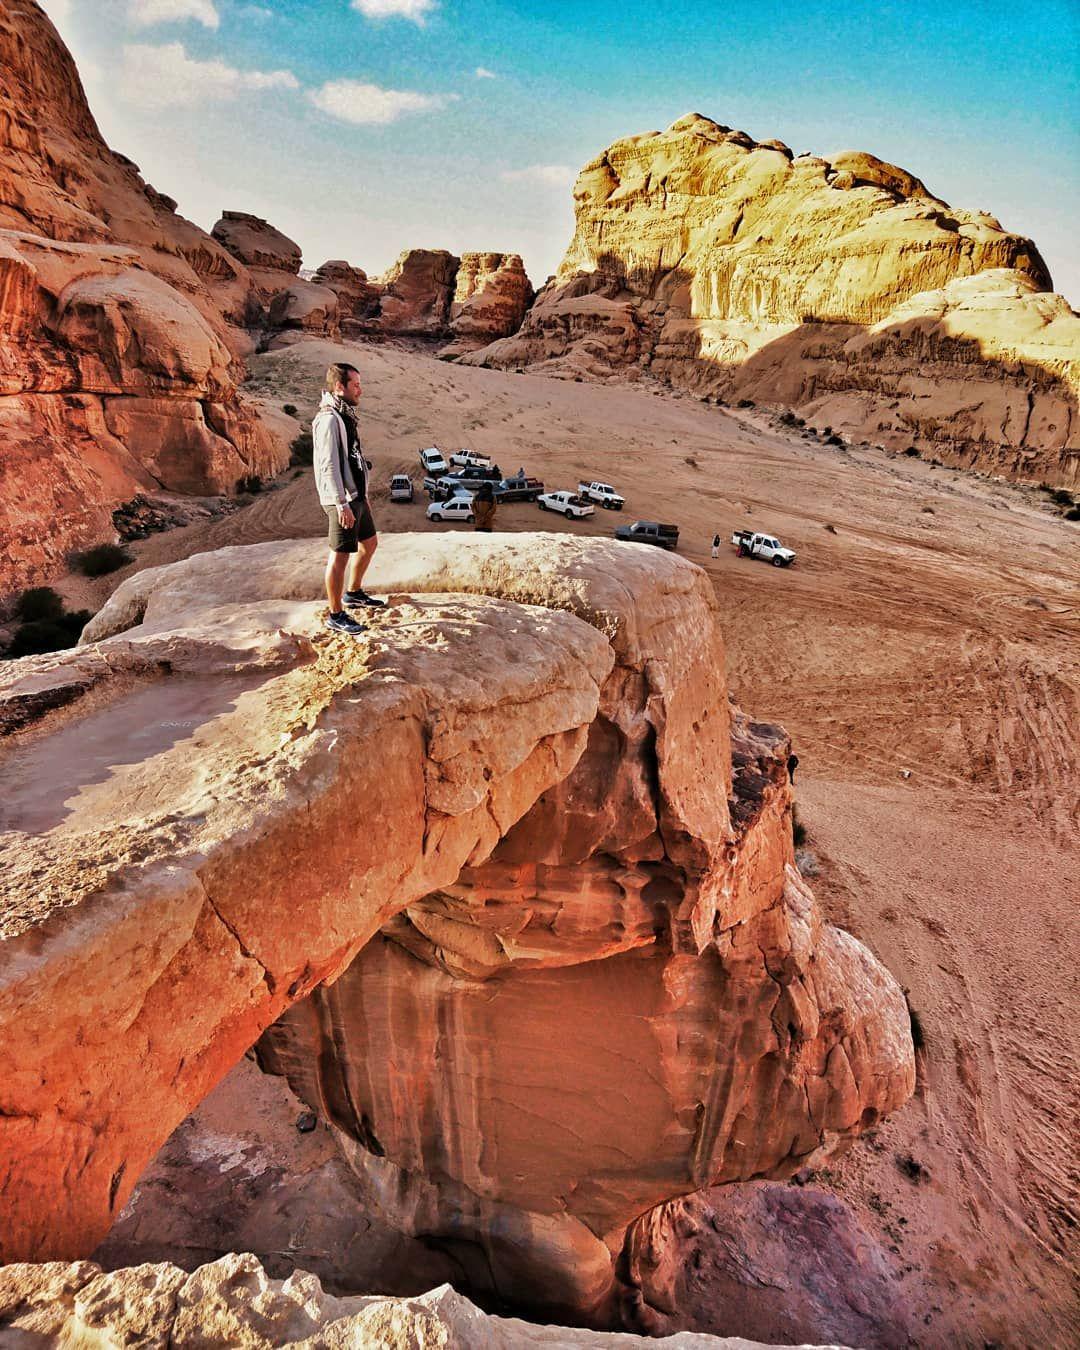 TBT, Wadi Rum. . . Wadi Rum - Giordania ???????? #petra #jordan #lucky #giordania #sevenwonders #traveler #viaggiatore #trail #run #desert #explore #explorer #camping #sentieri #picoftheday #photography #flight #hiking #adventure #adventuretime #travel #instatravel #instatraveling #followme #canon #visitjordan #jordanpass #wonder #follow @pir #wadirum